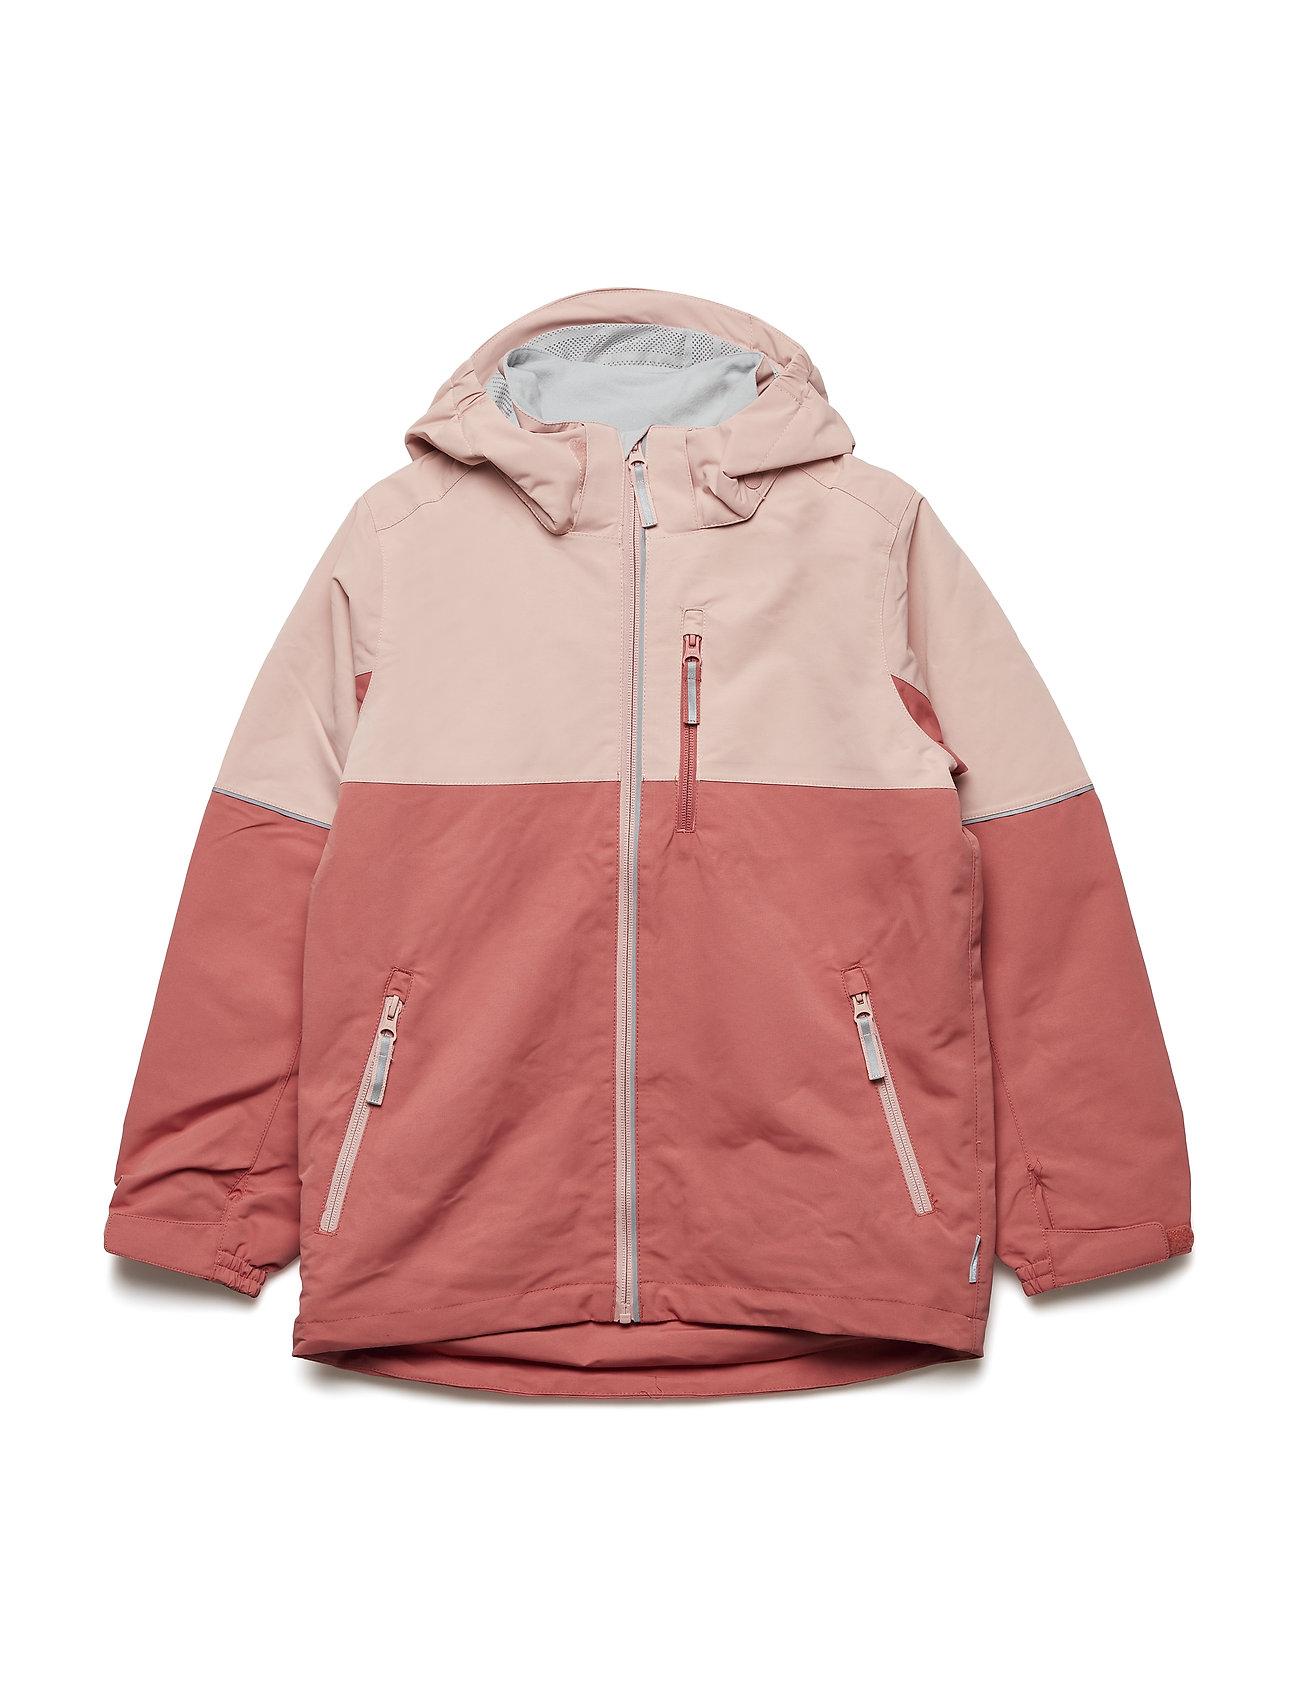 Polarn O. Pyret Jacket Shell Solid School